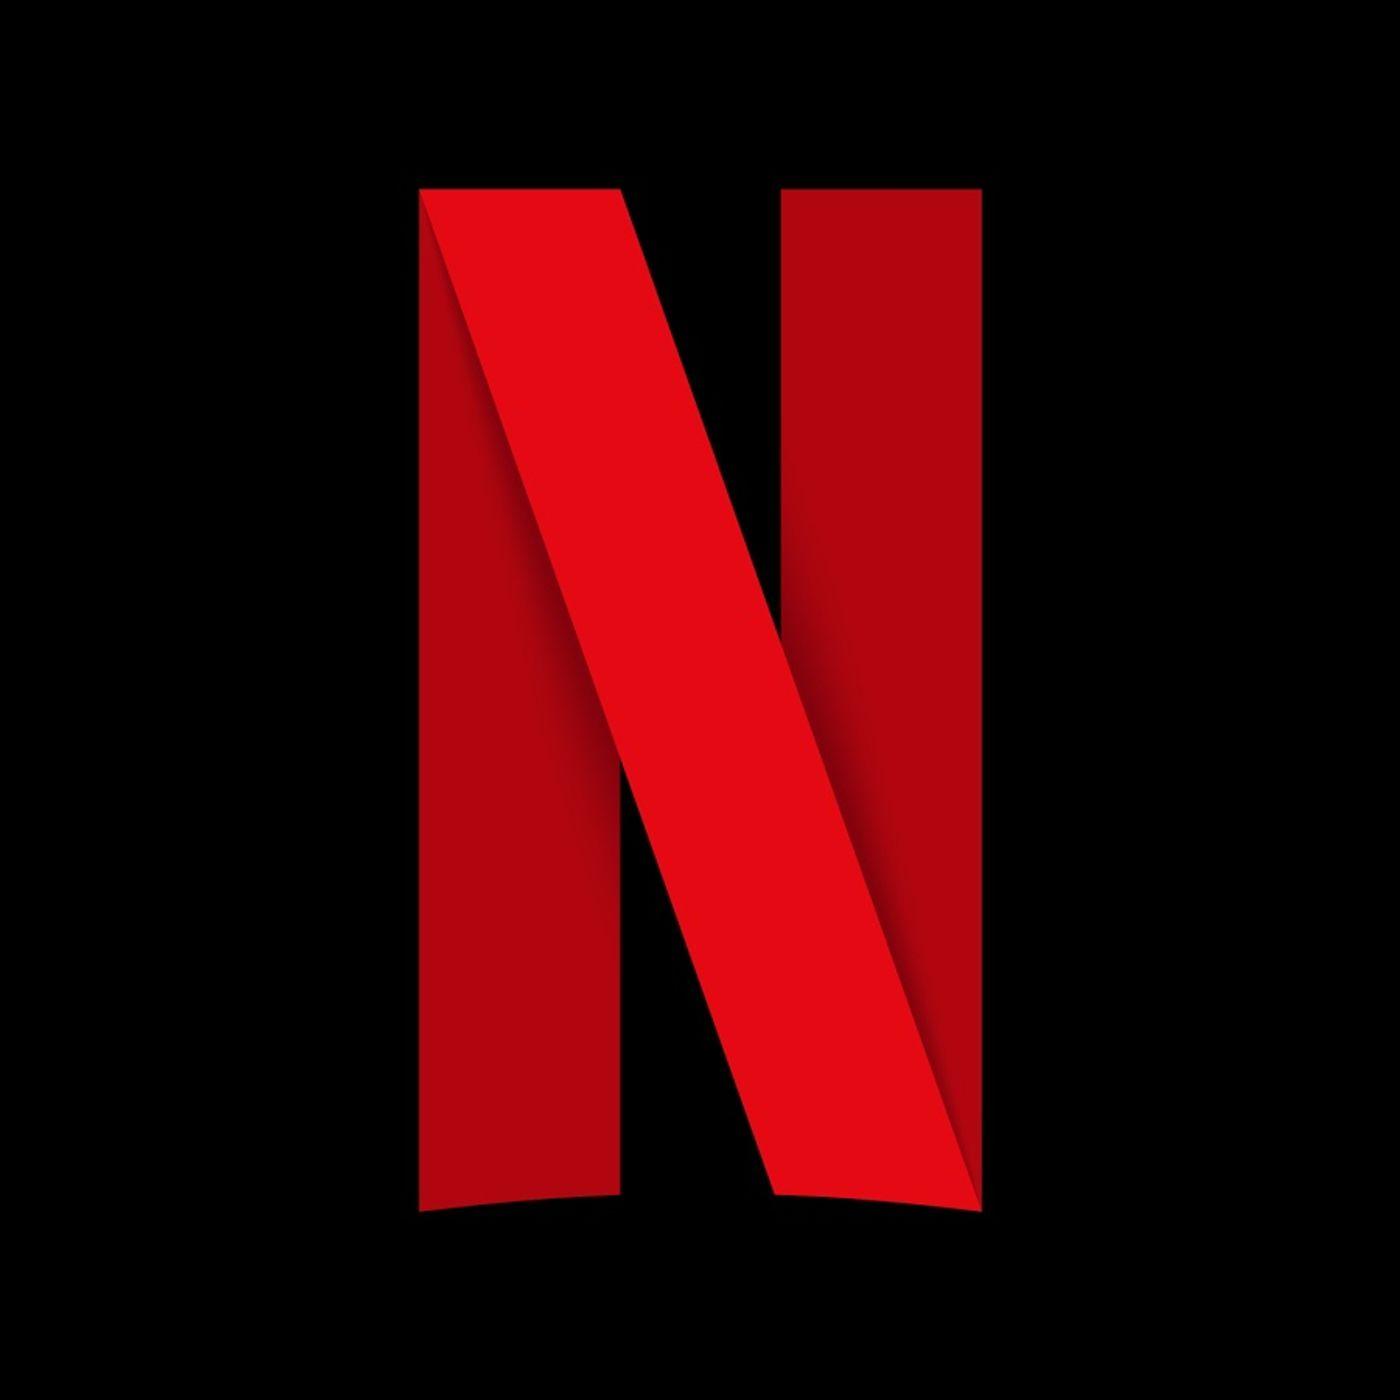 218) Netflix analisi anticonformista e controcorrente. #netflix